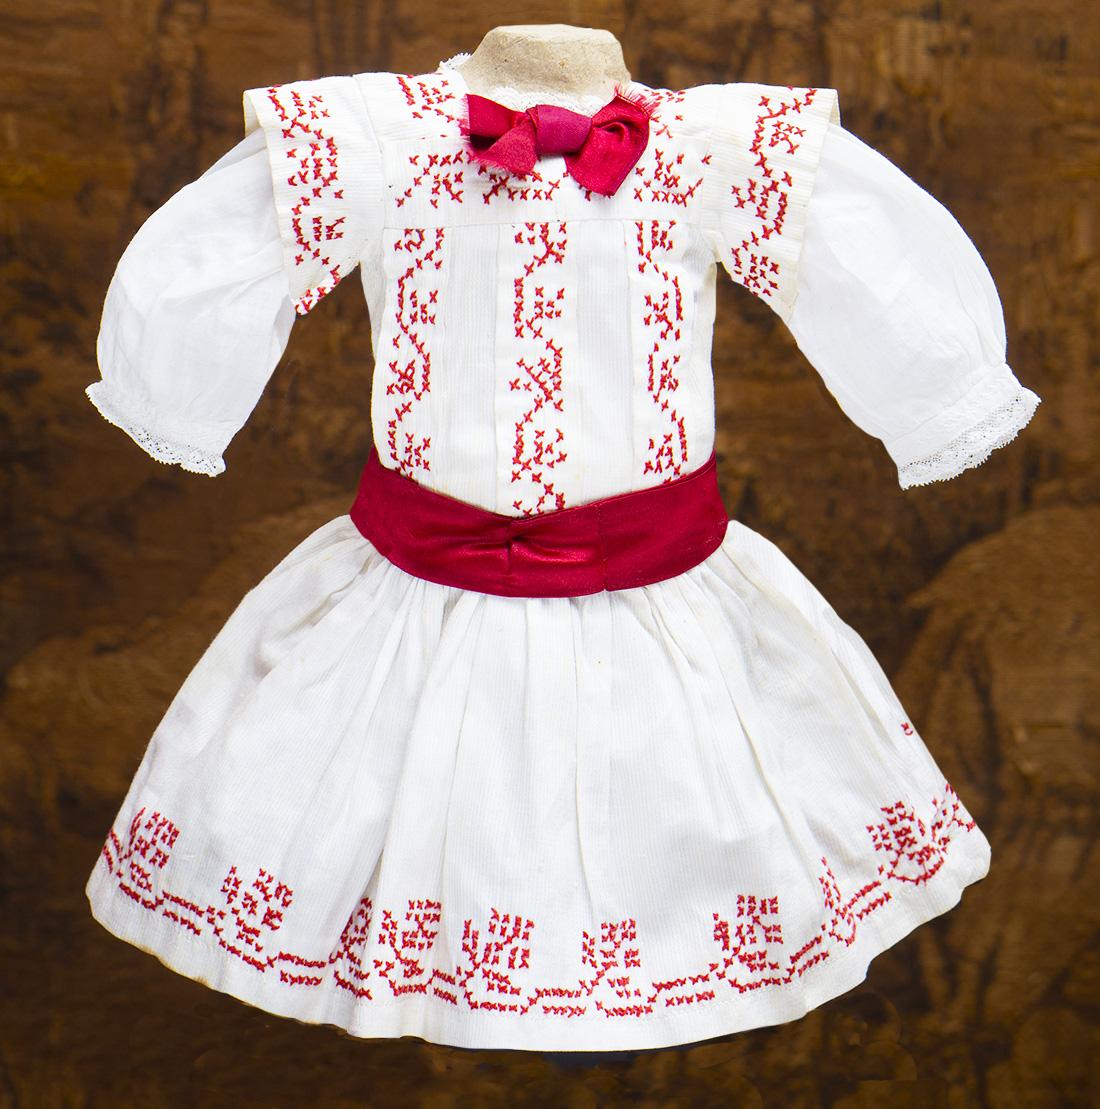 Antique Original Pinafore Dress